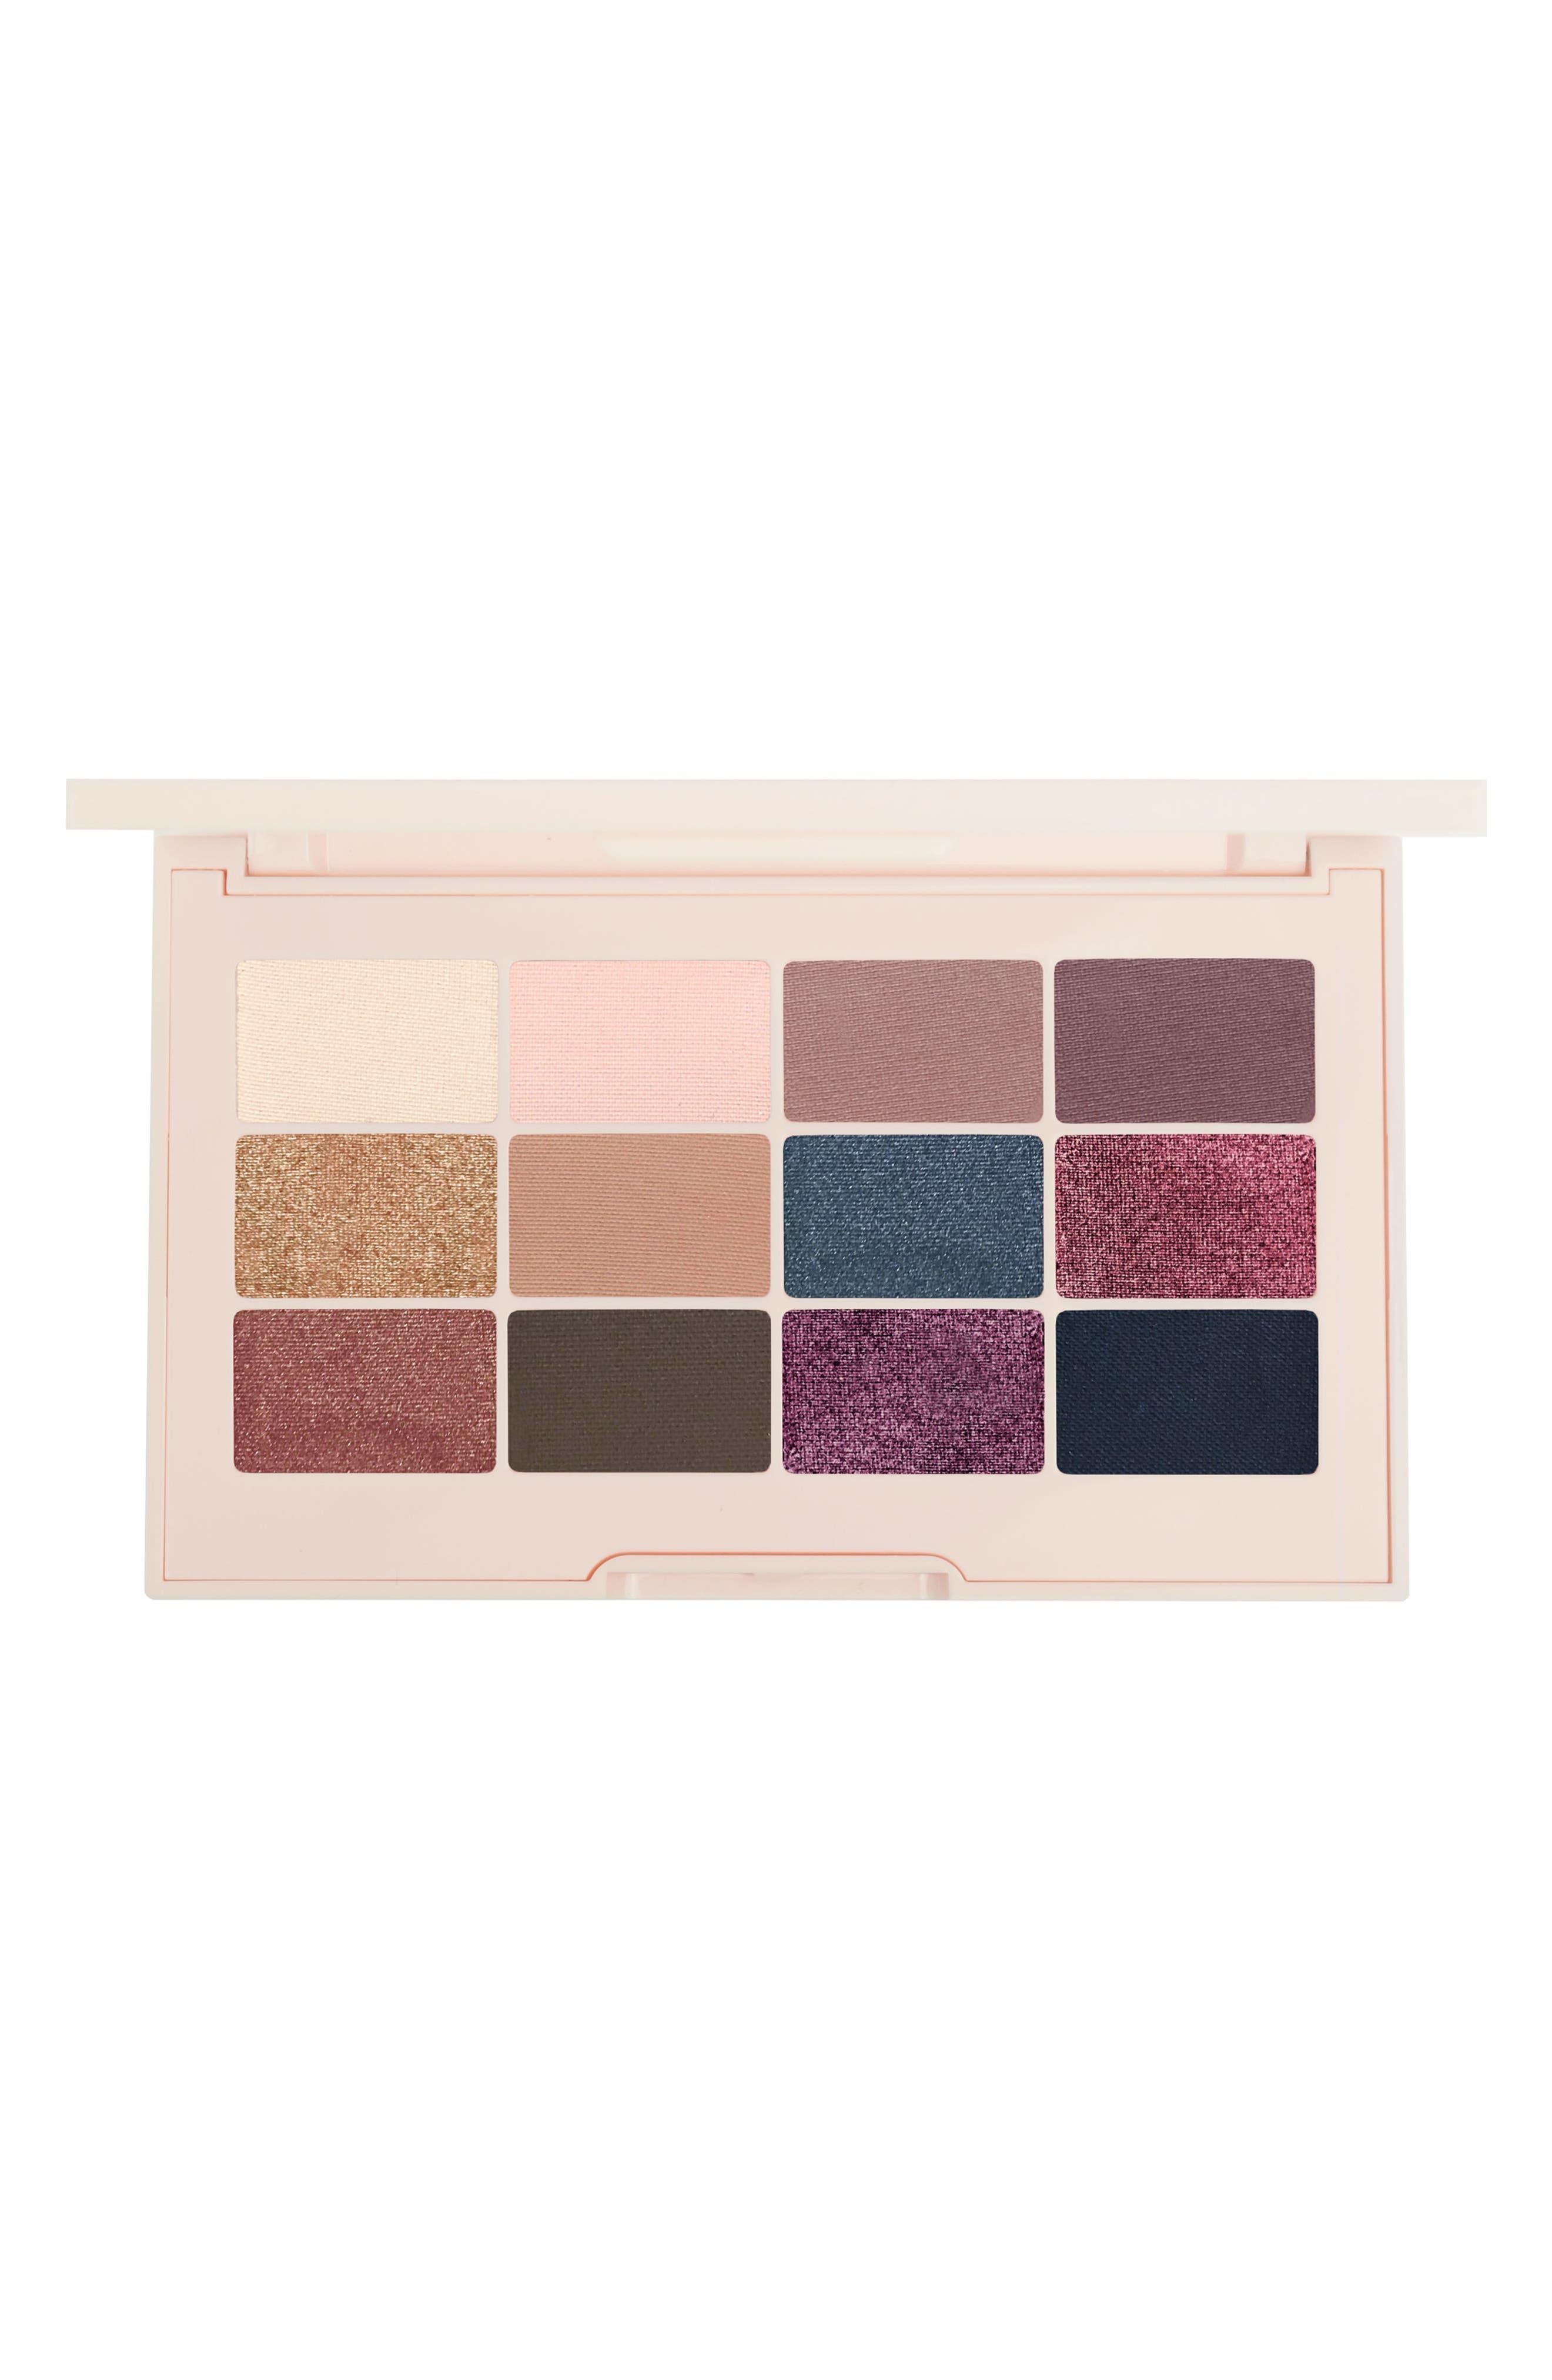 Jouer Springtime in Paris Matte & Shimmer Eyeshadow Palette